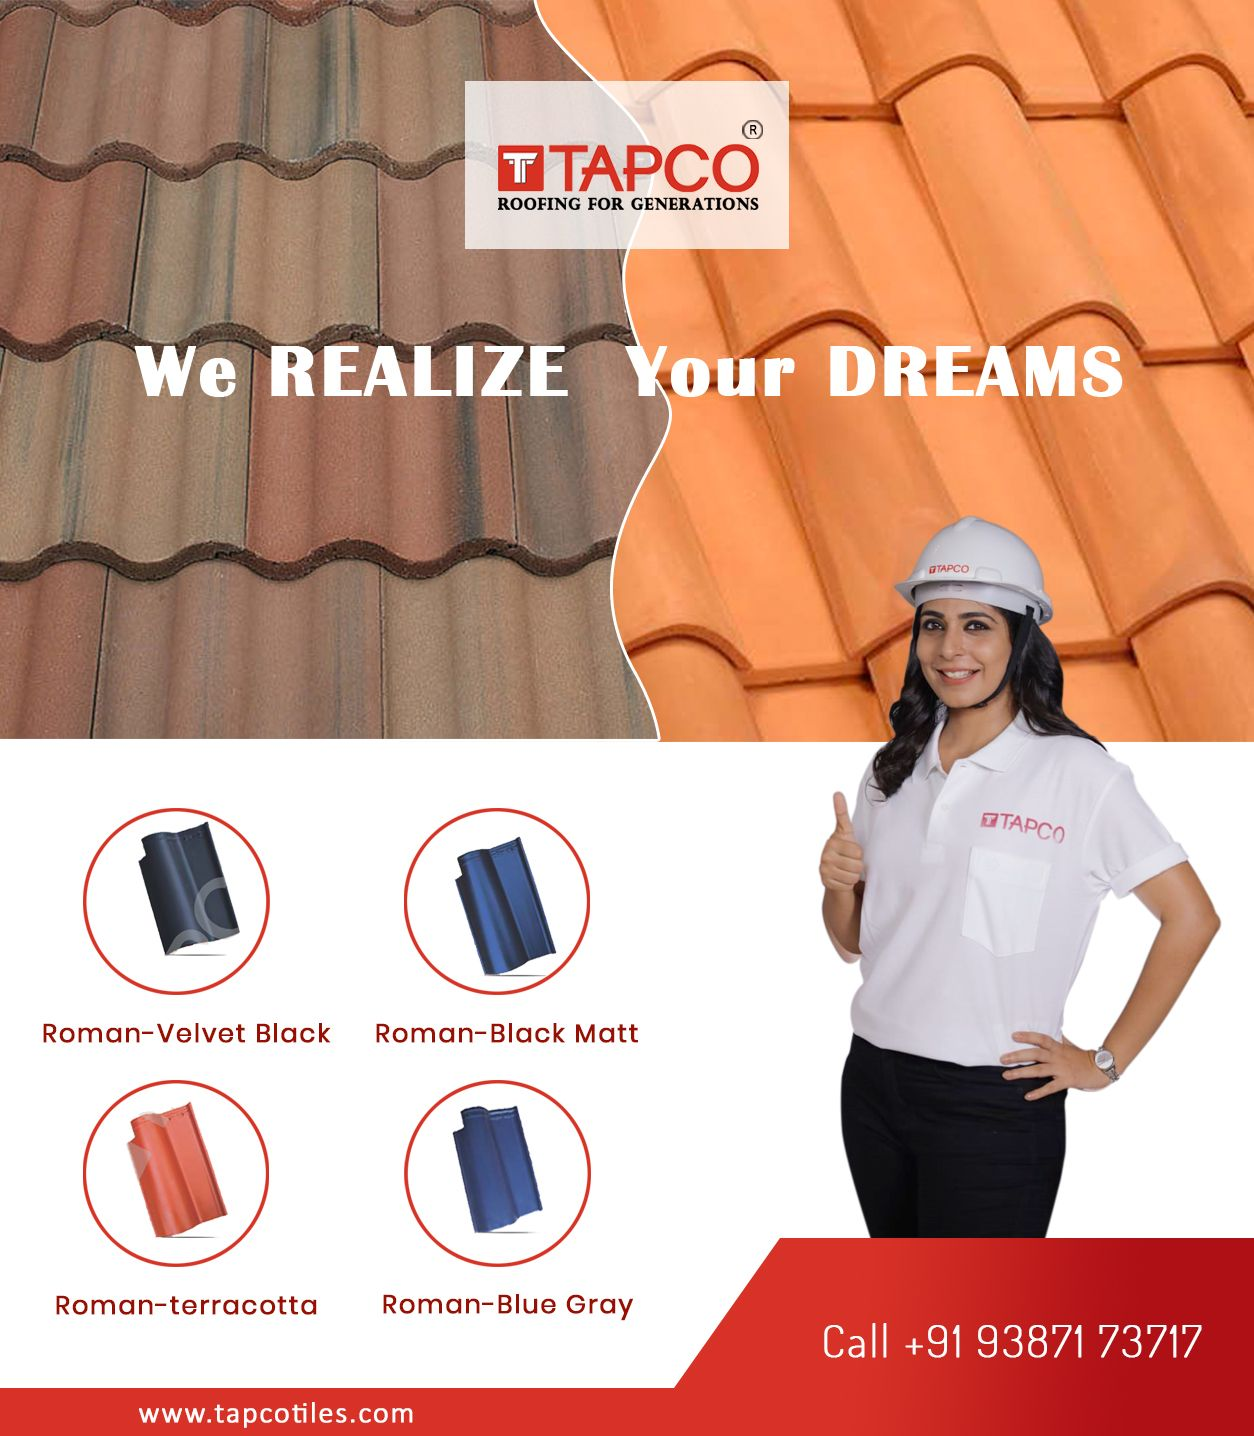 Tapco Premium Roof Tiles In 2020 Ceramic Roof Tiles Roof Tiles Roof